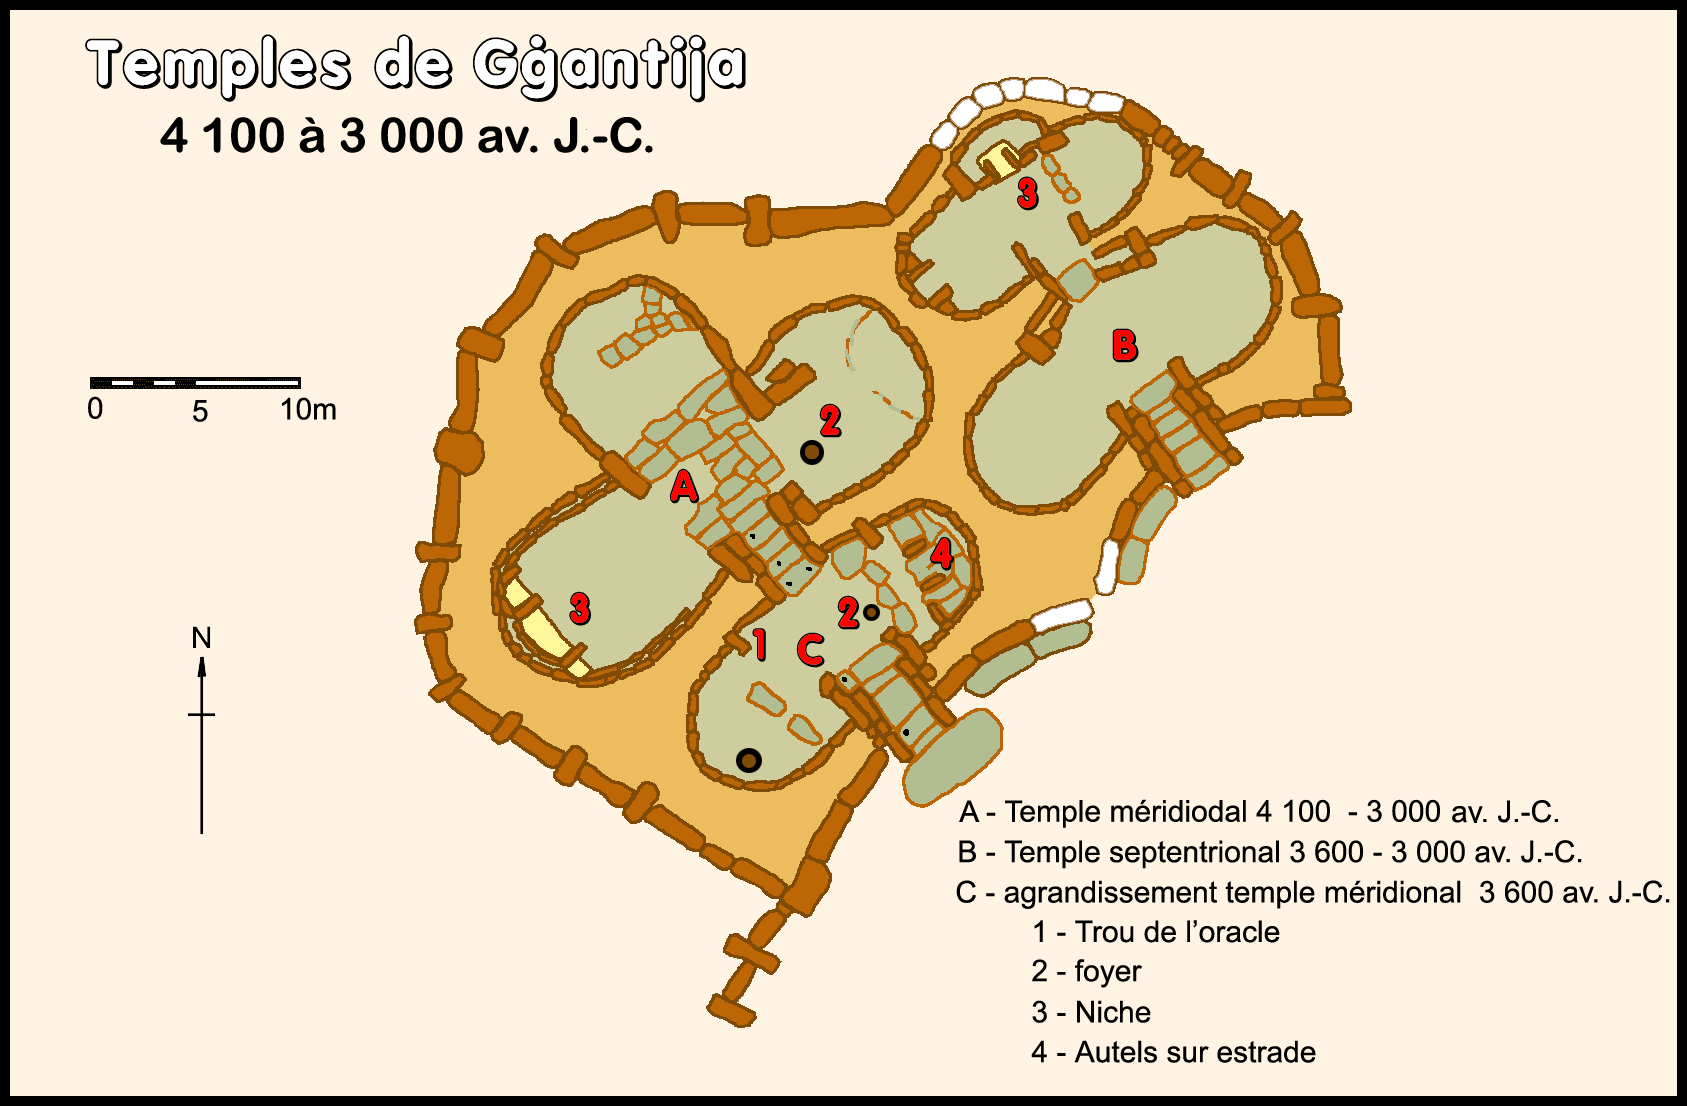 Plan des temples de Ggantija